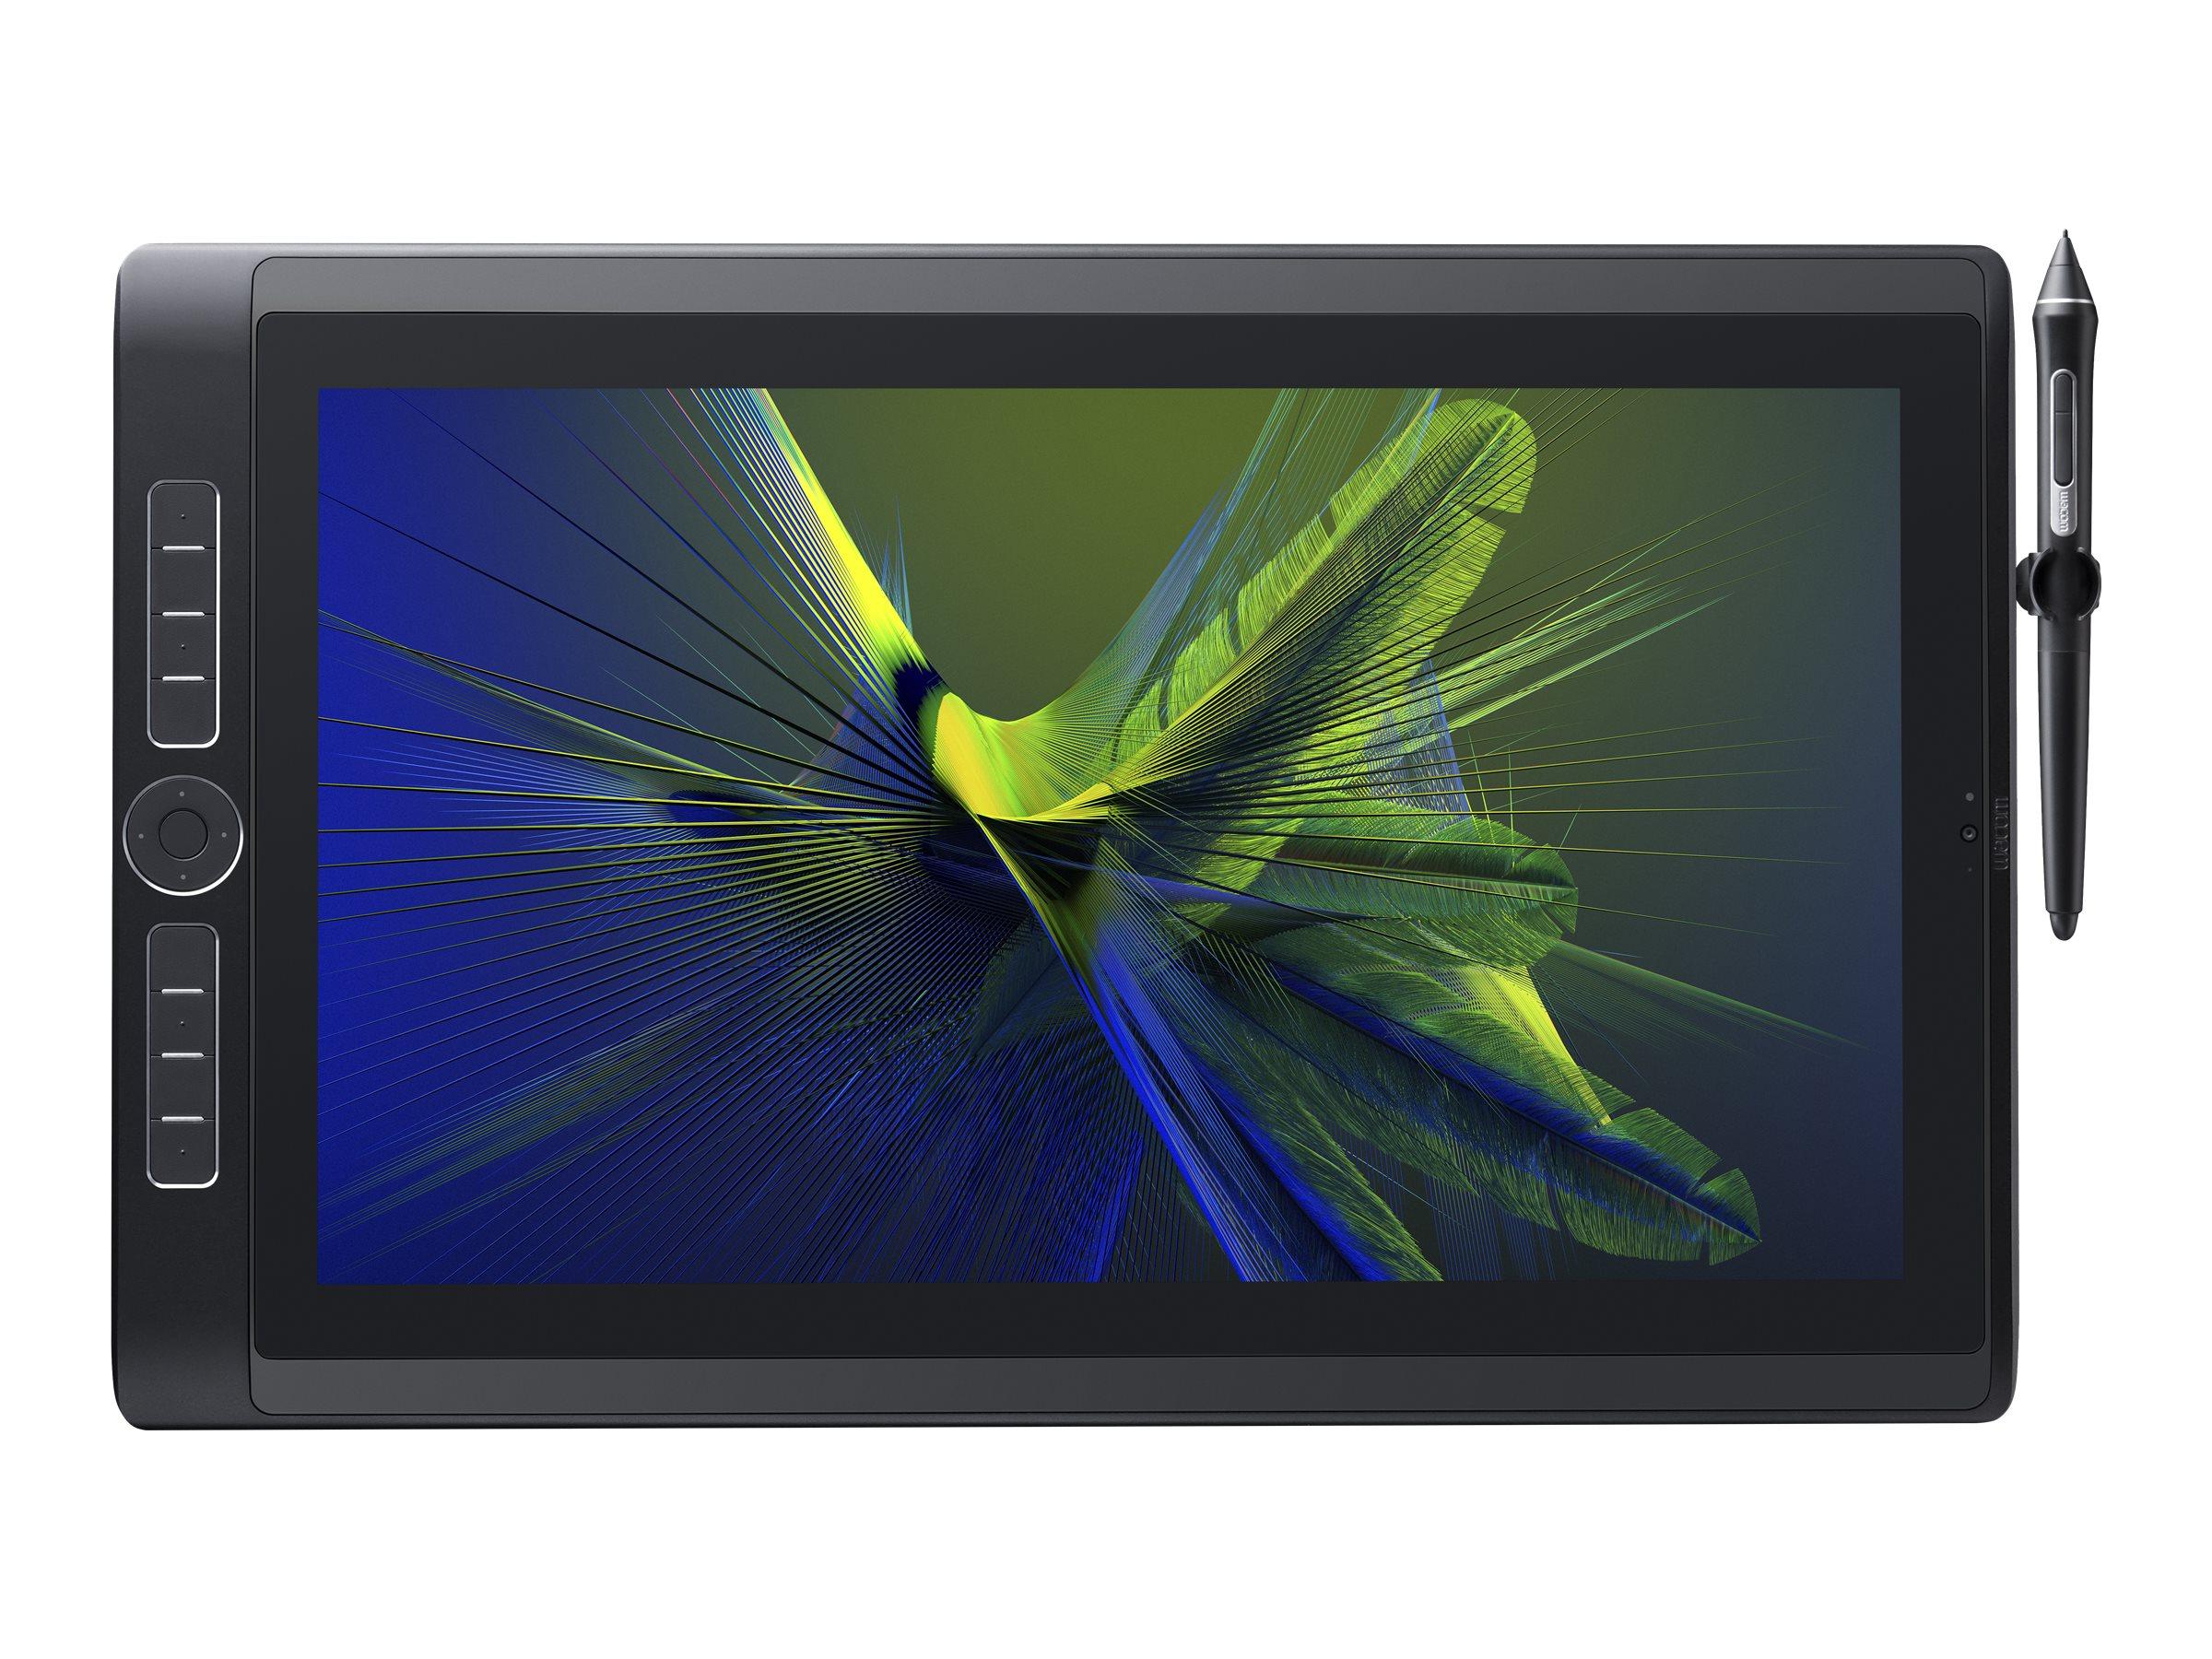 Wacom MobileStudio Pro DTH-W1620M - Tablet - Core i5 6267U / 2.9 GHz - Win 10 Pro - 8 GB RAM - 256 GB SSD